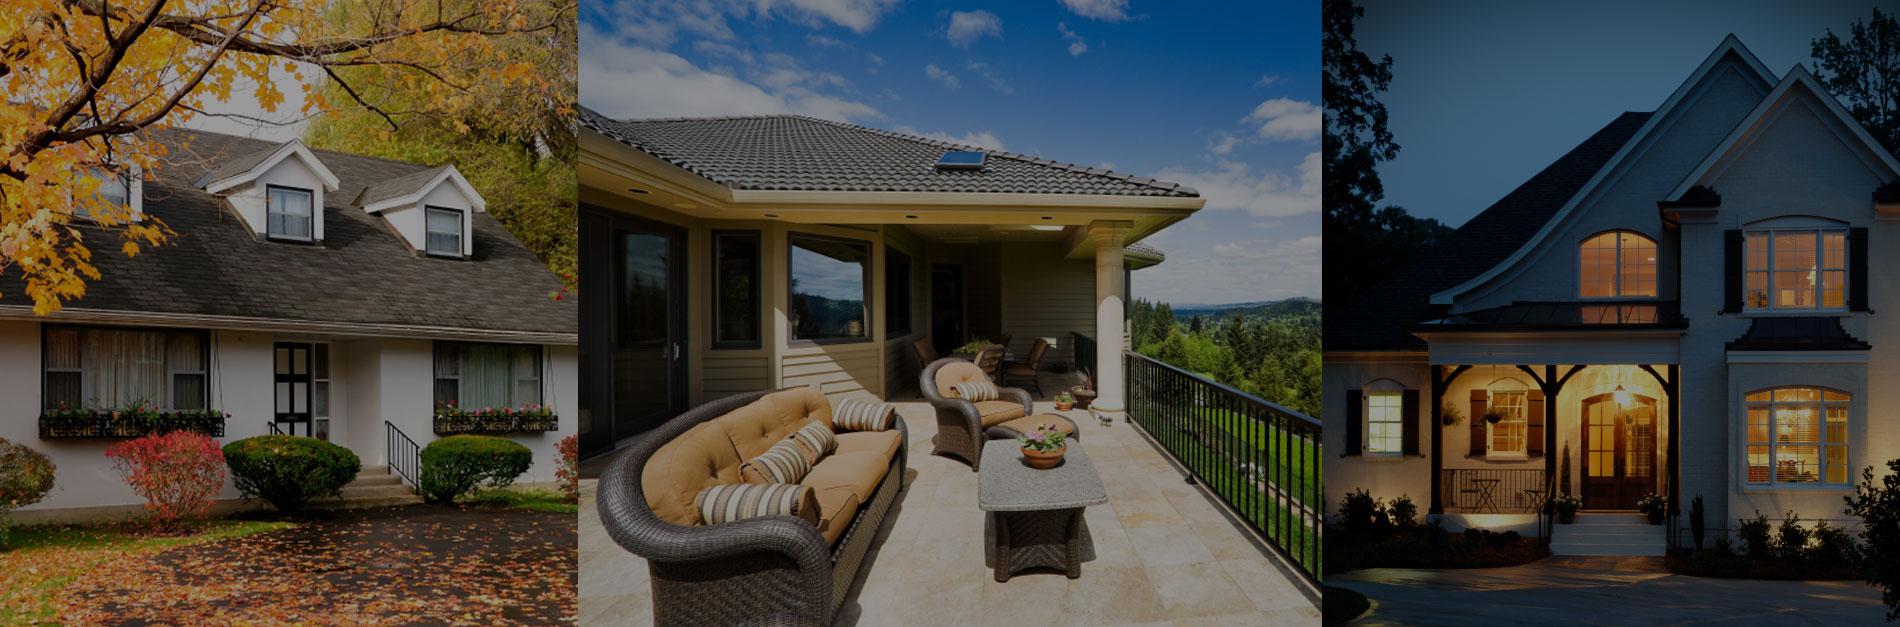 Blue Oak Property Management, Inc.